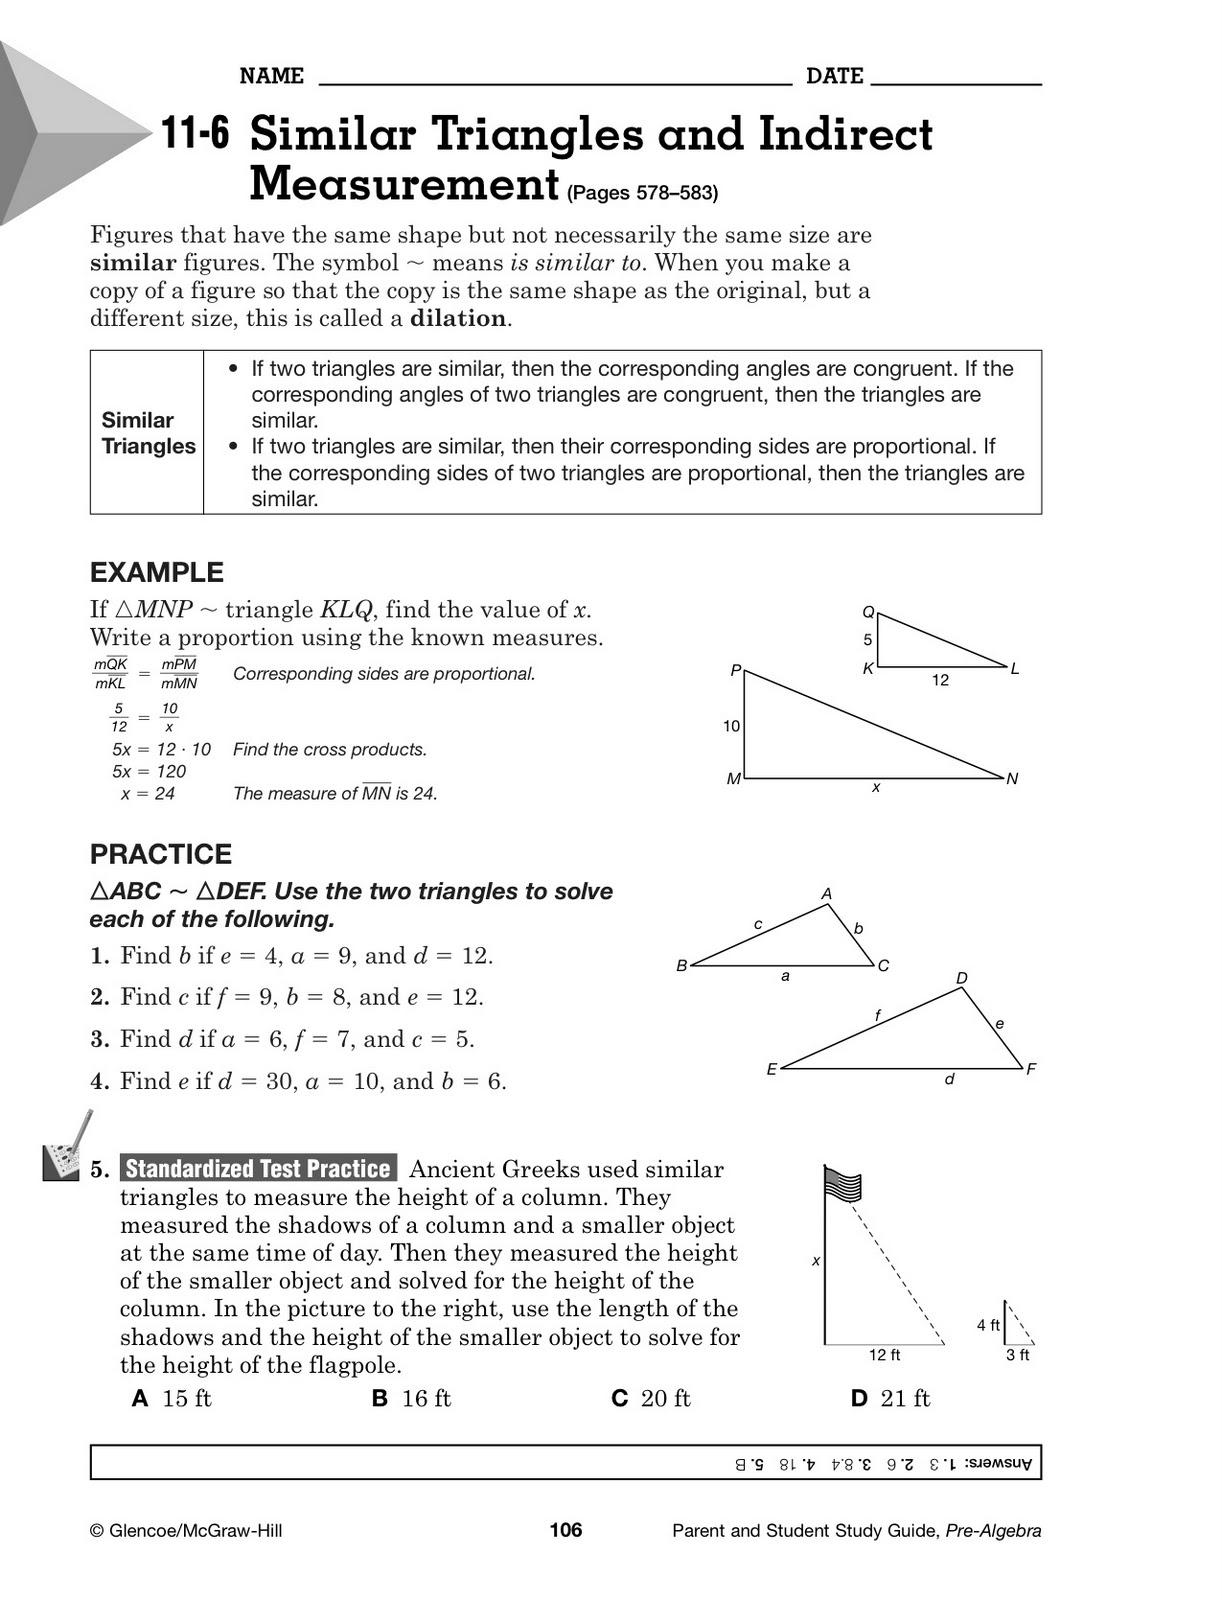 Study Guide Glencoe Images